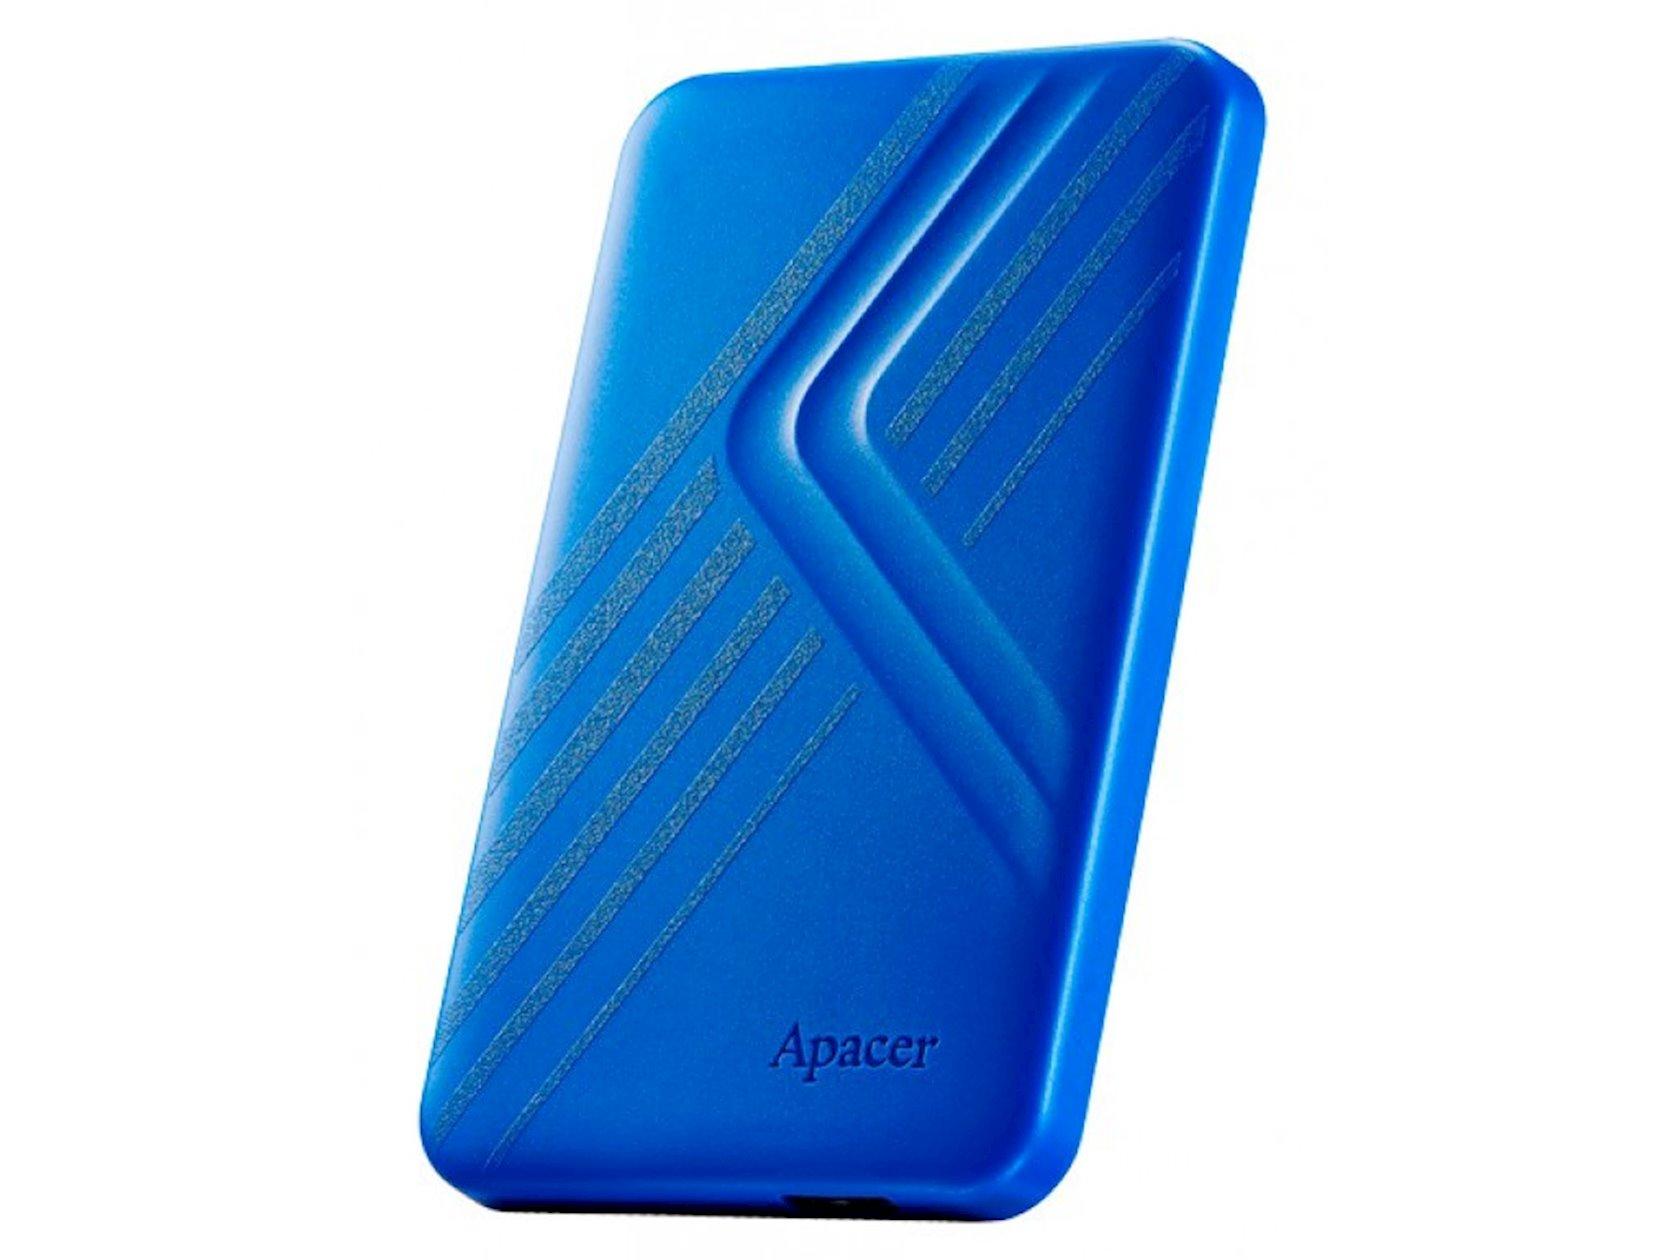 Xarici sərt disk Apacer 1 TB USB 3.1 Portable Hard Drive AC236 Blue